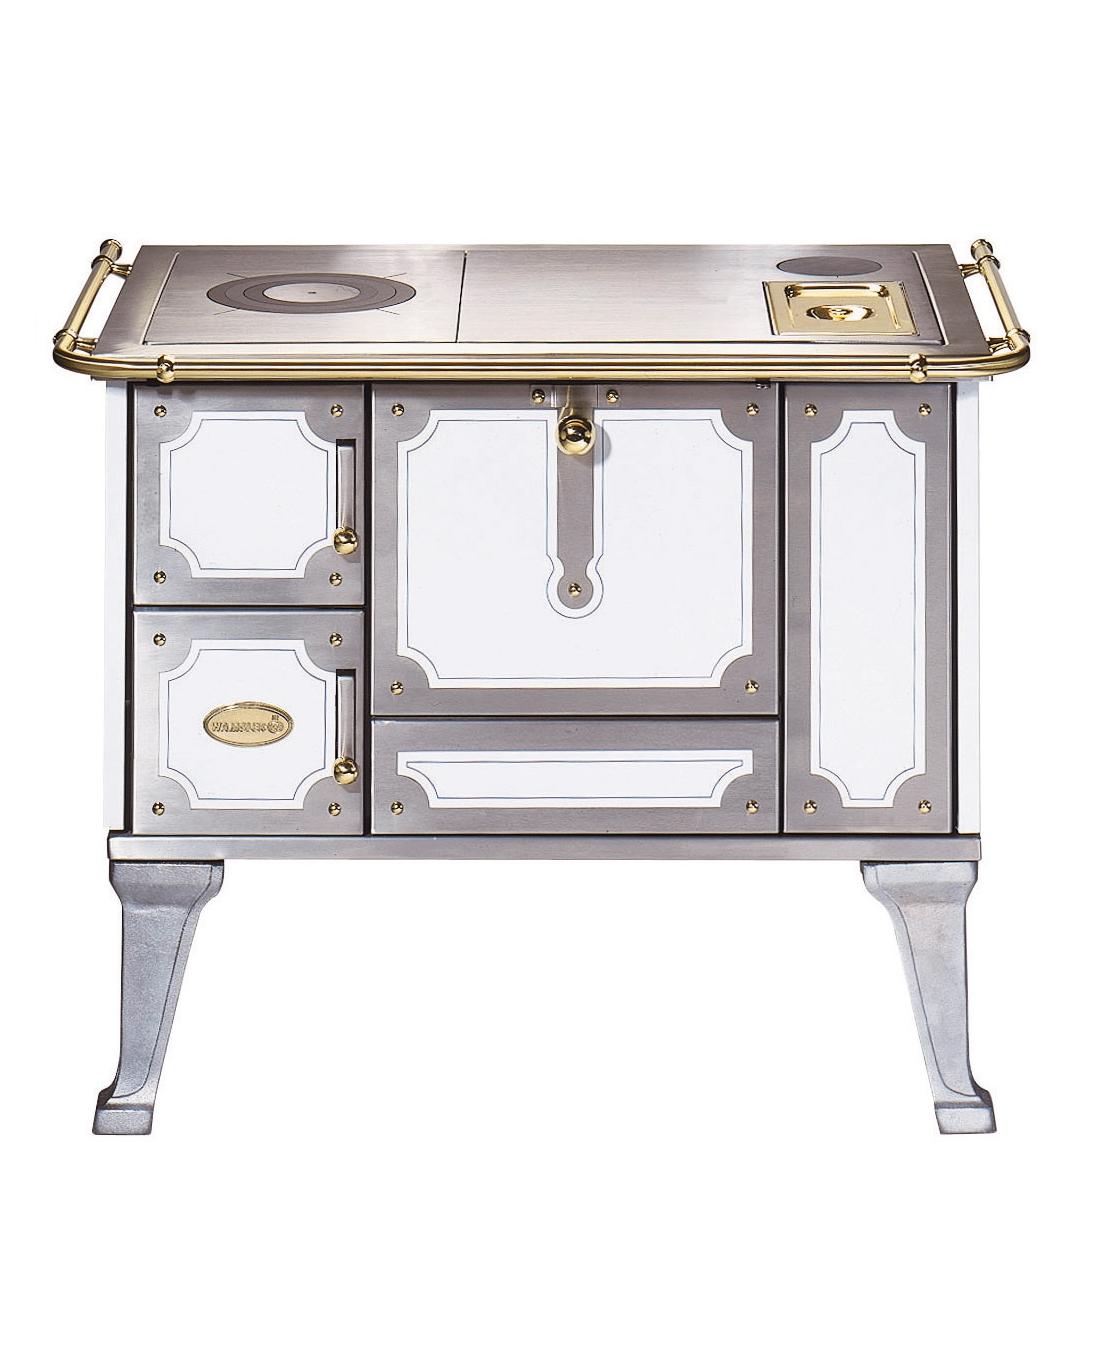 jubilaumsherd k 138 jh weiss wamsler gmbh. Black Bedroom Furniture Sets. Home Design Ideas